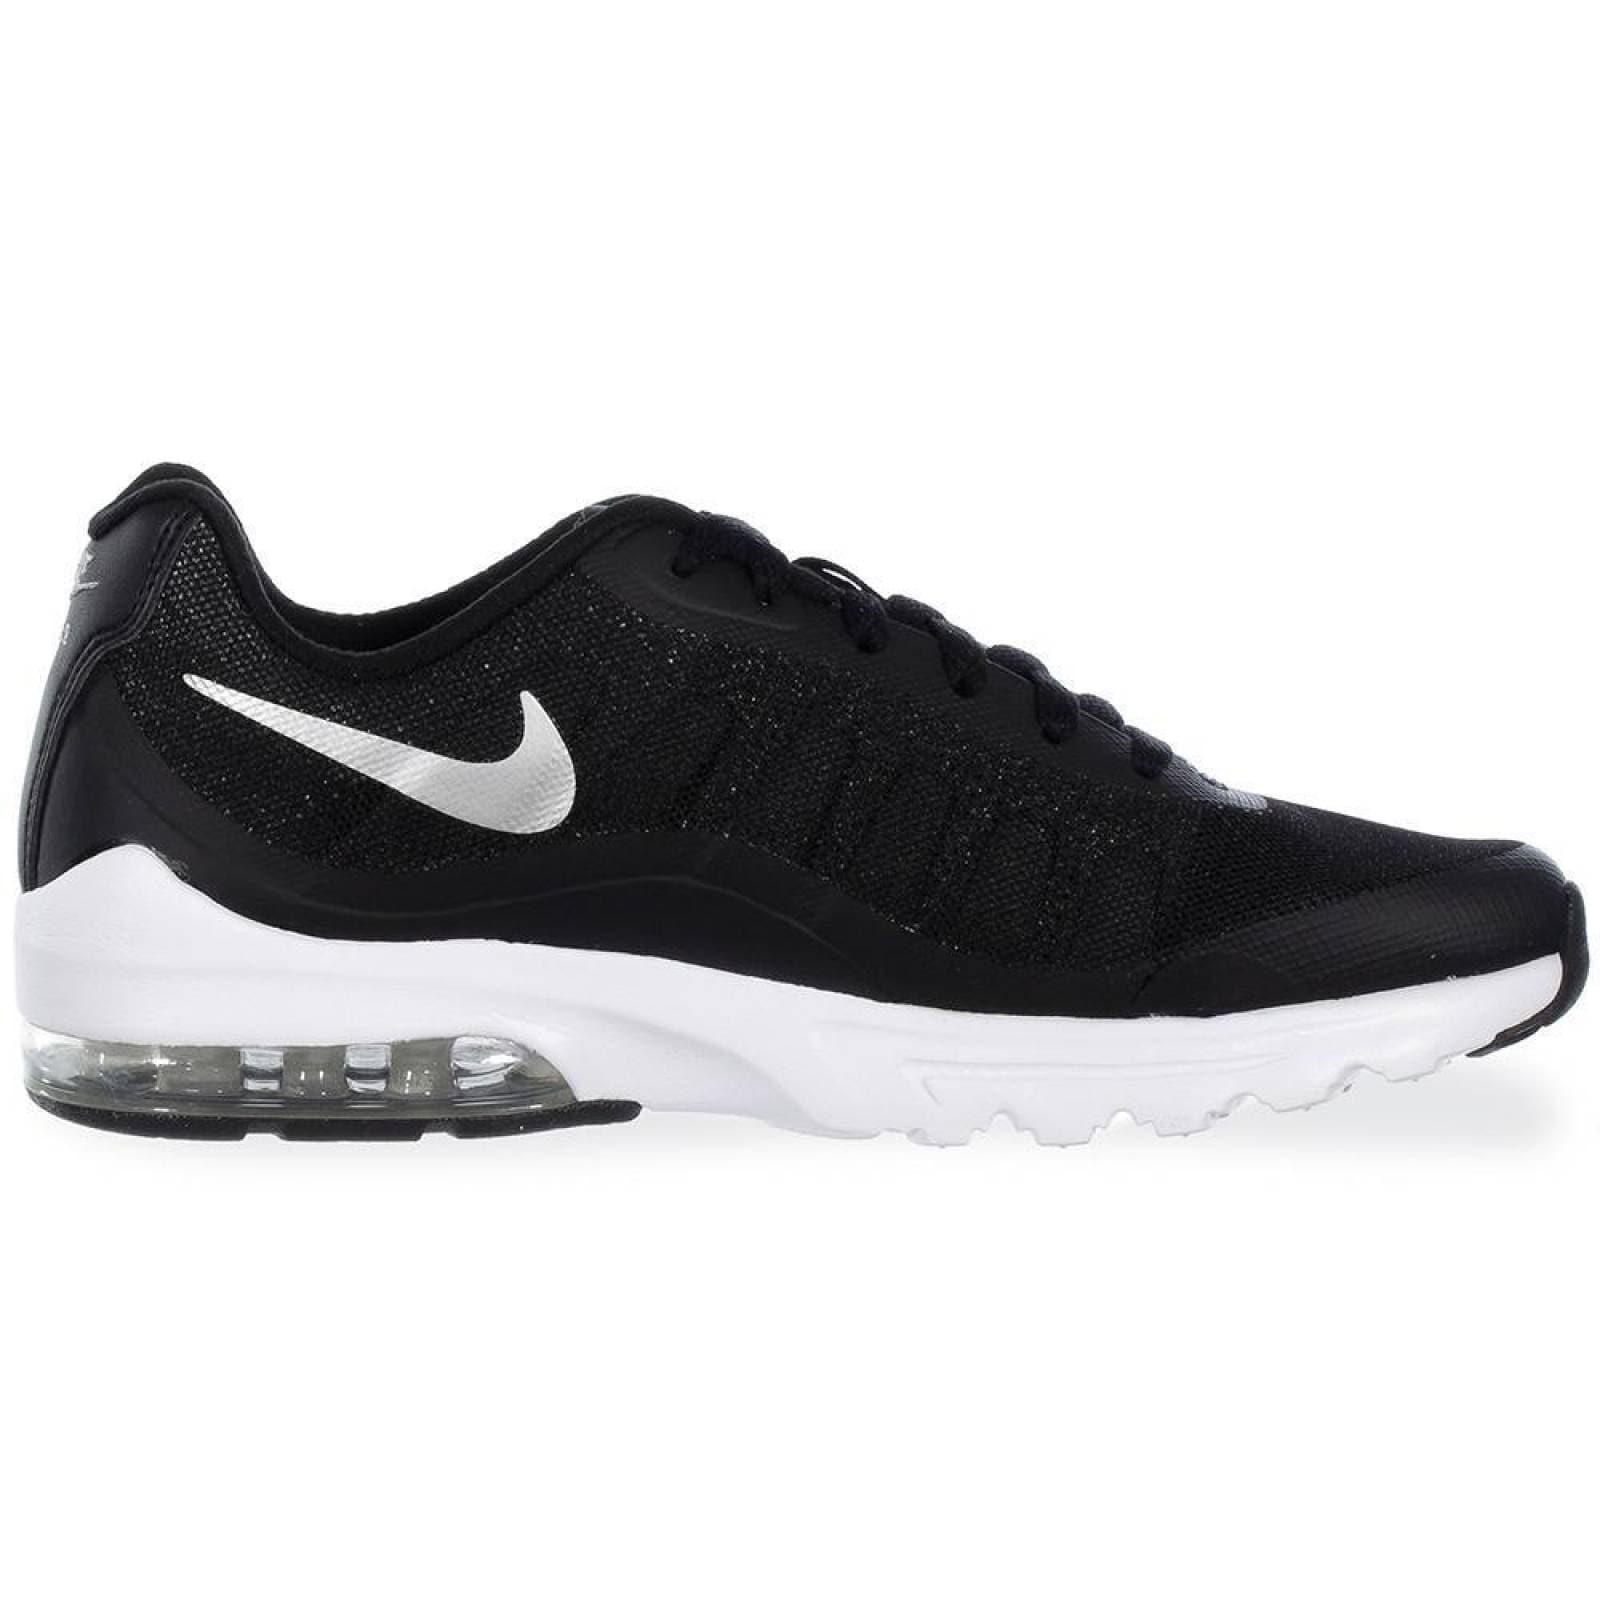 Tenis Nike Air Max Invigor 749866001 Negro Mujer